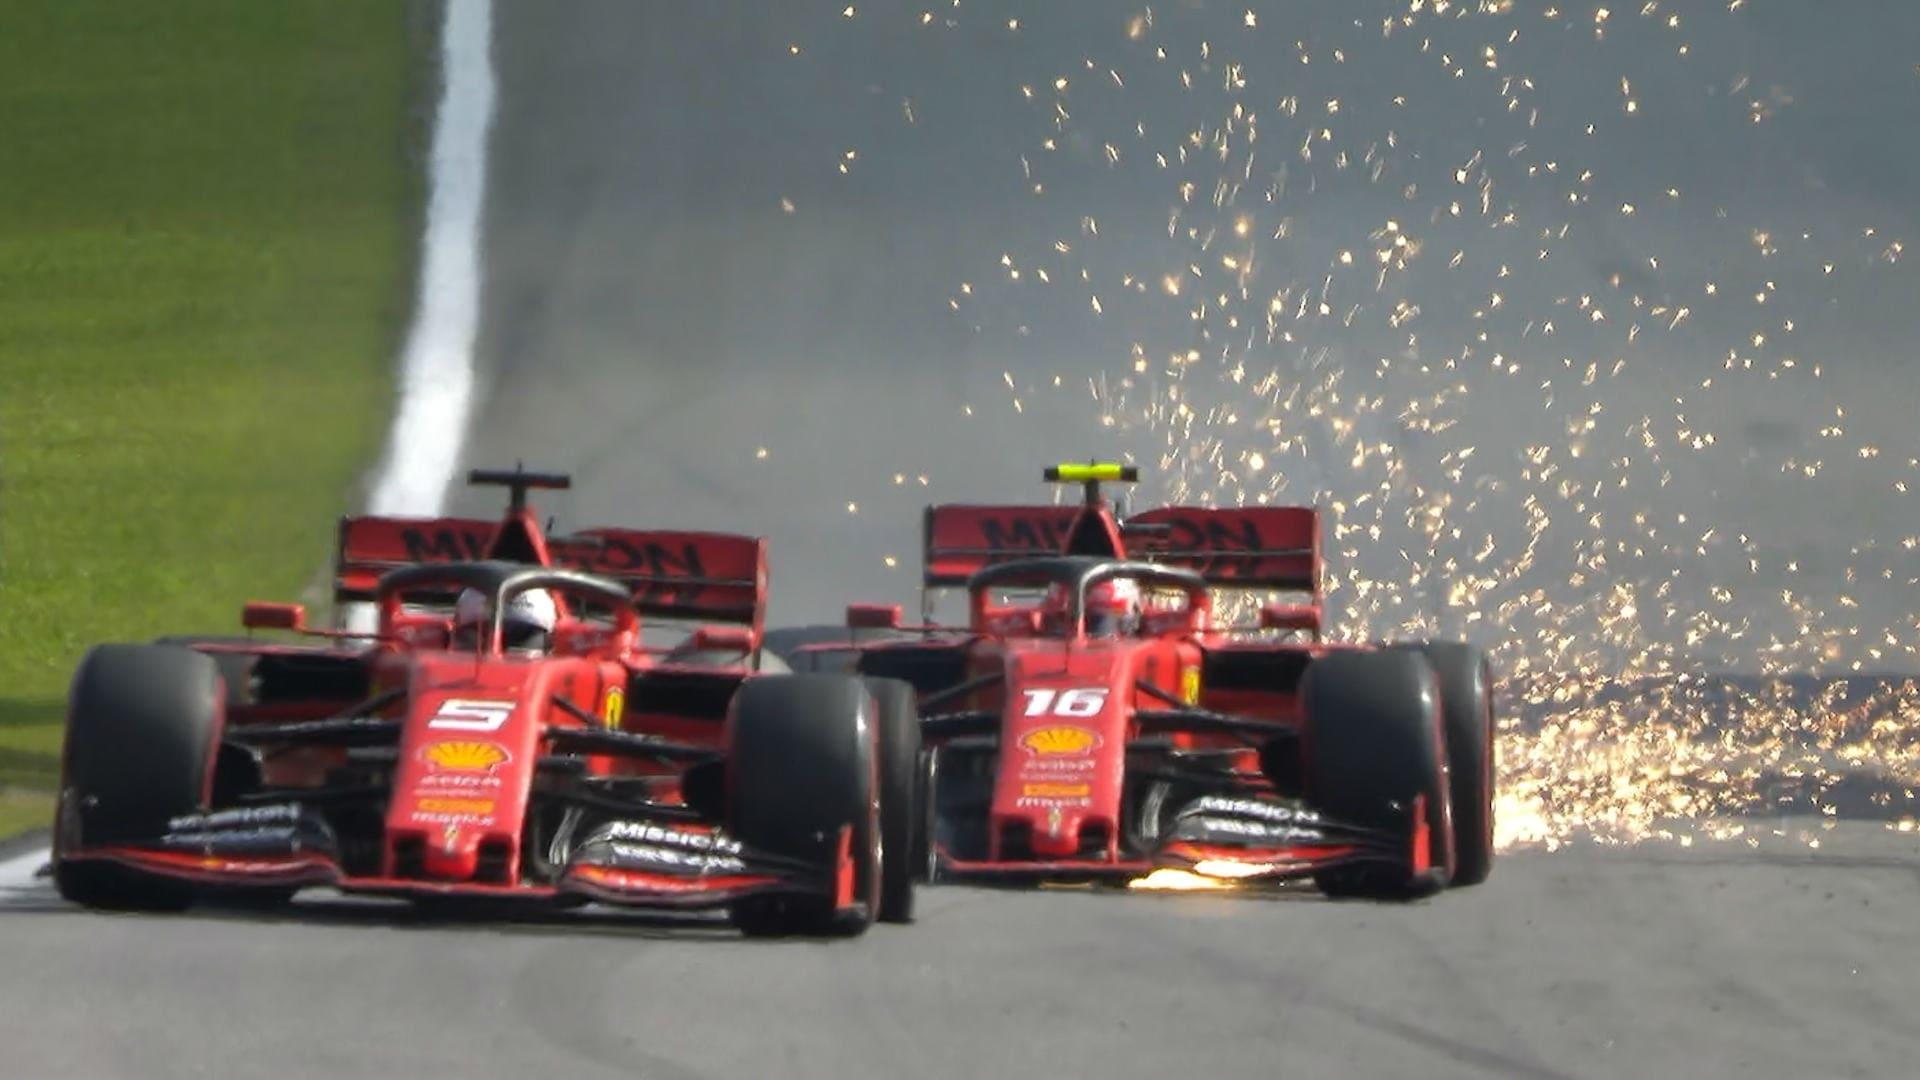 Обзор Формула 1 Гран-при Бразилии 2019